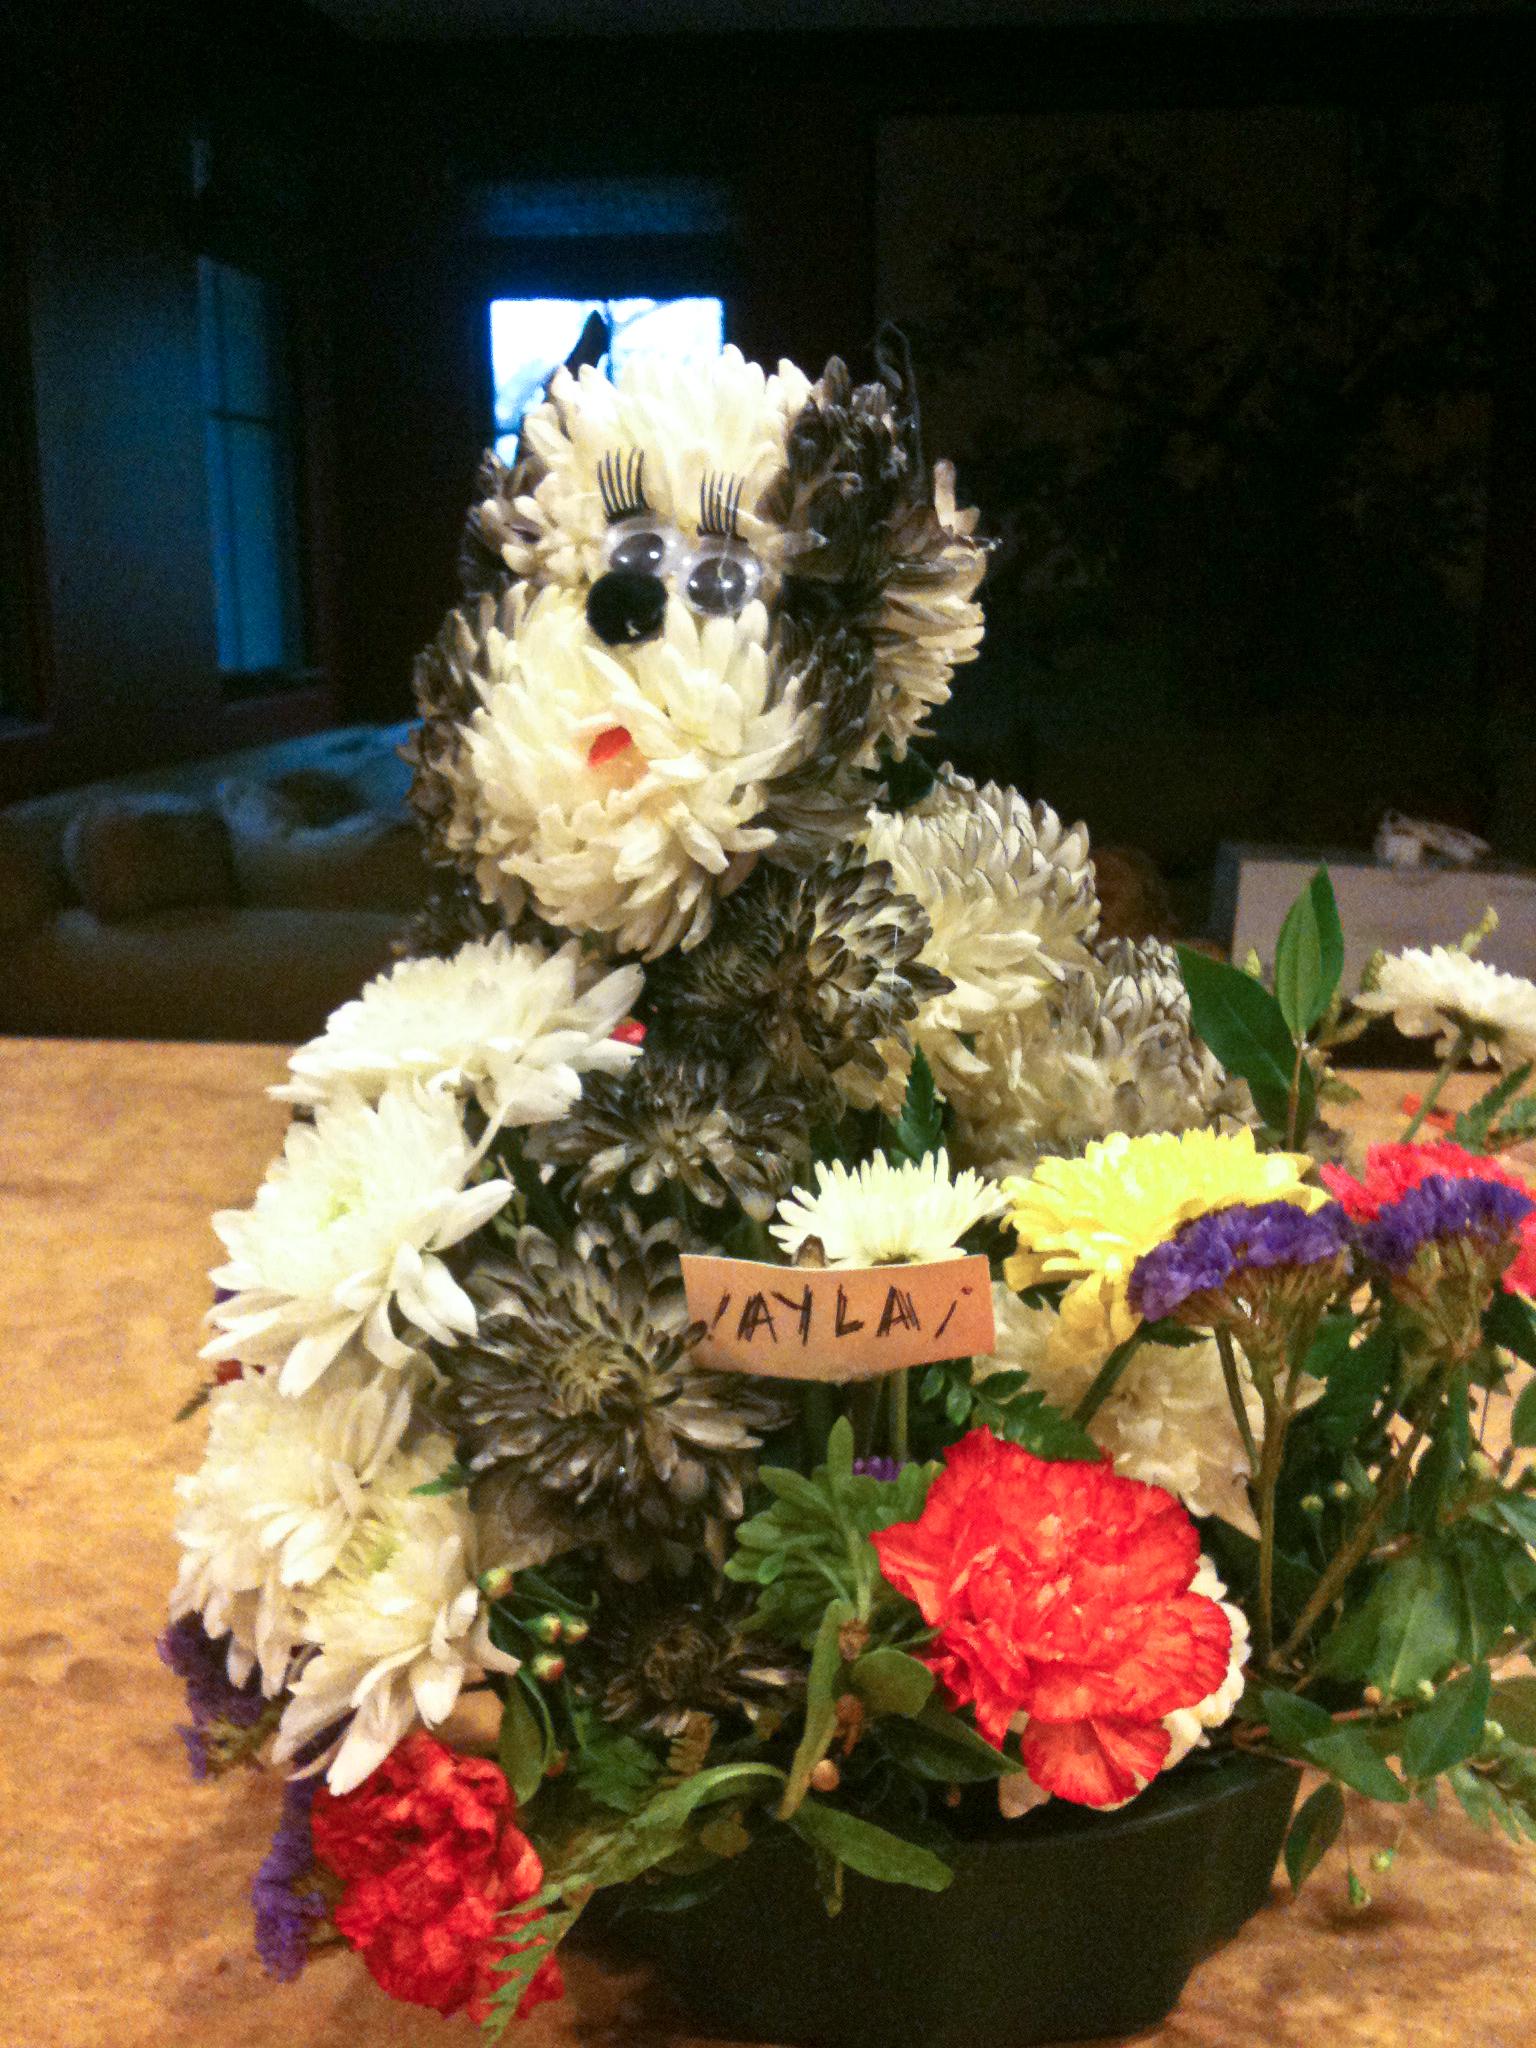 Boston terrier floral arrangement - funk in deep freeze